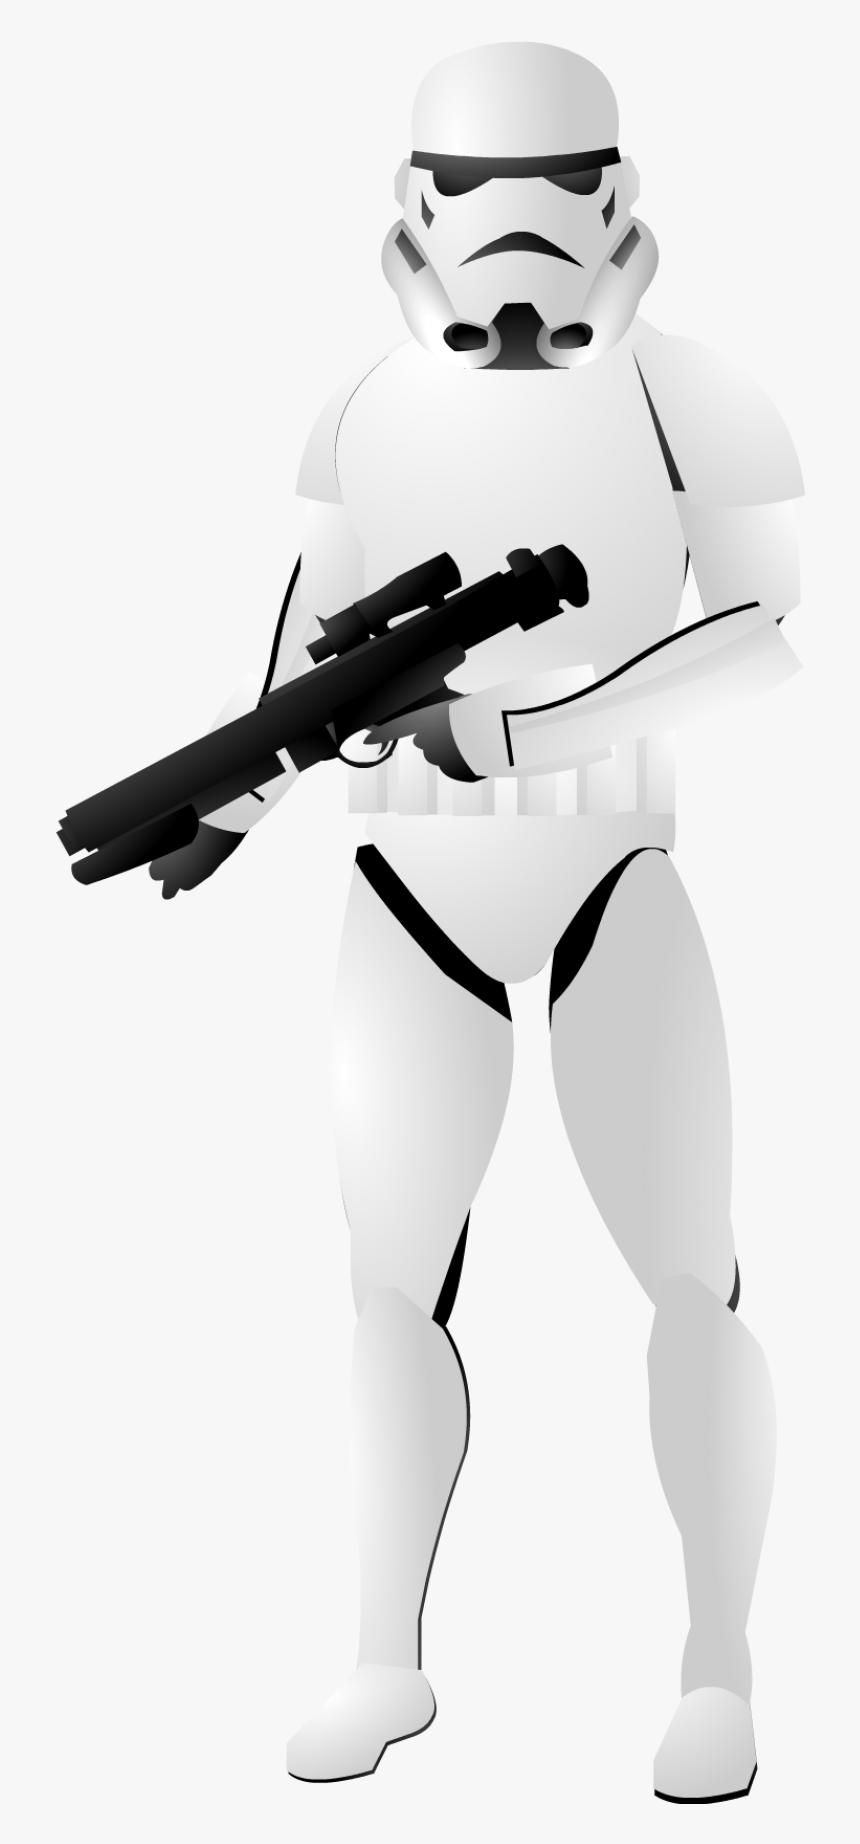 Stormtrooper Background Transparent - Stormtrooper Pictures No Background, HD Png Download, Free Download